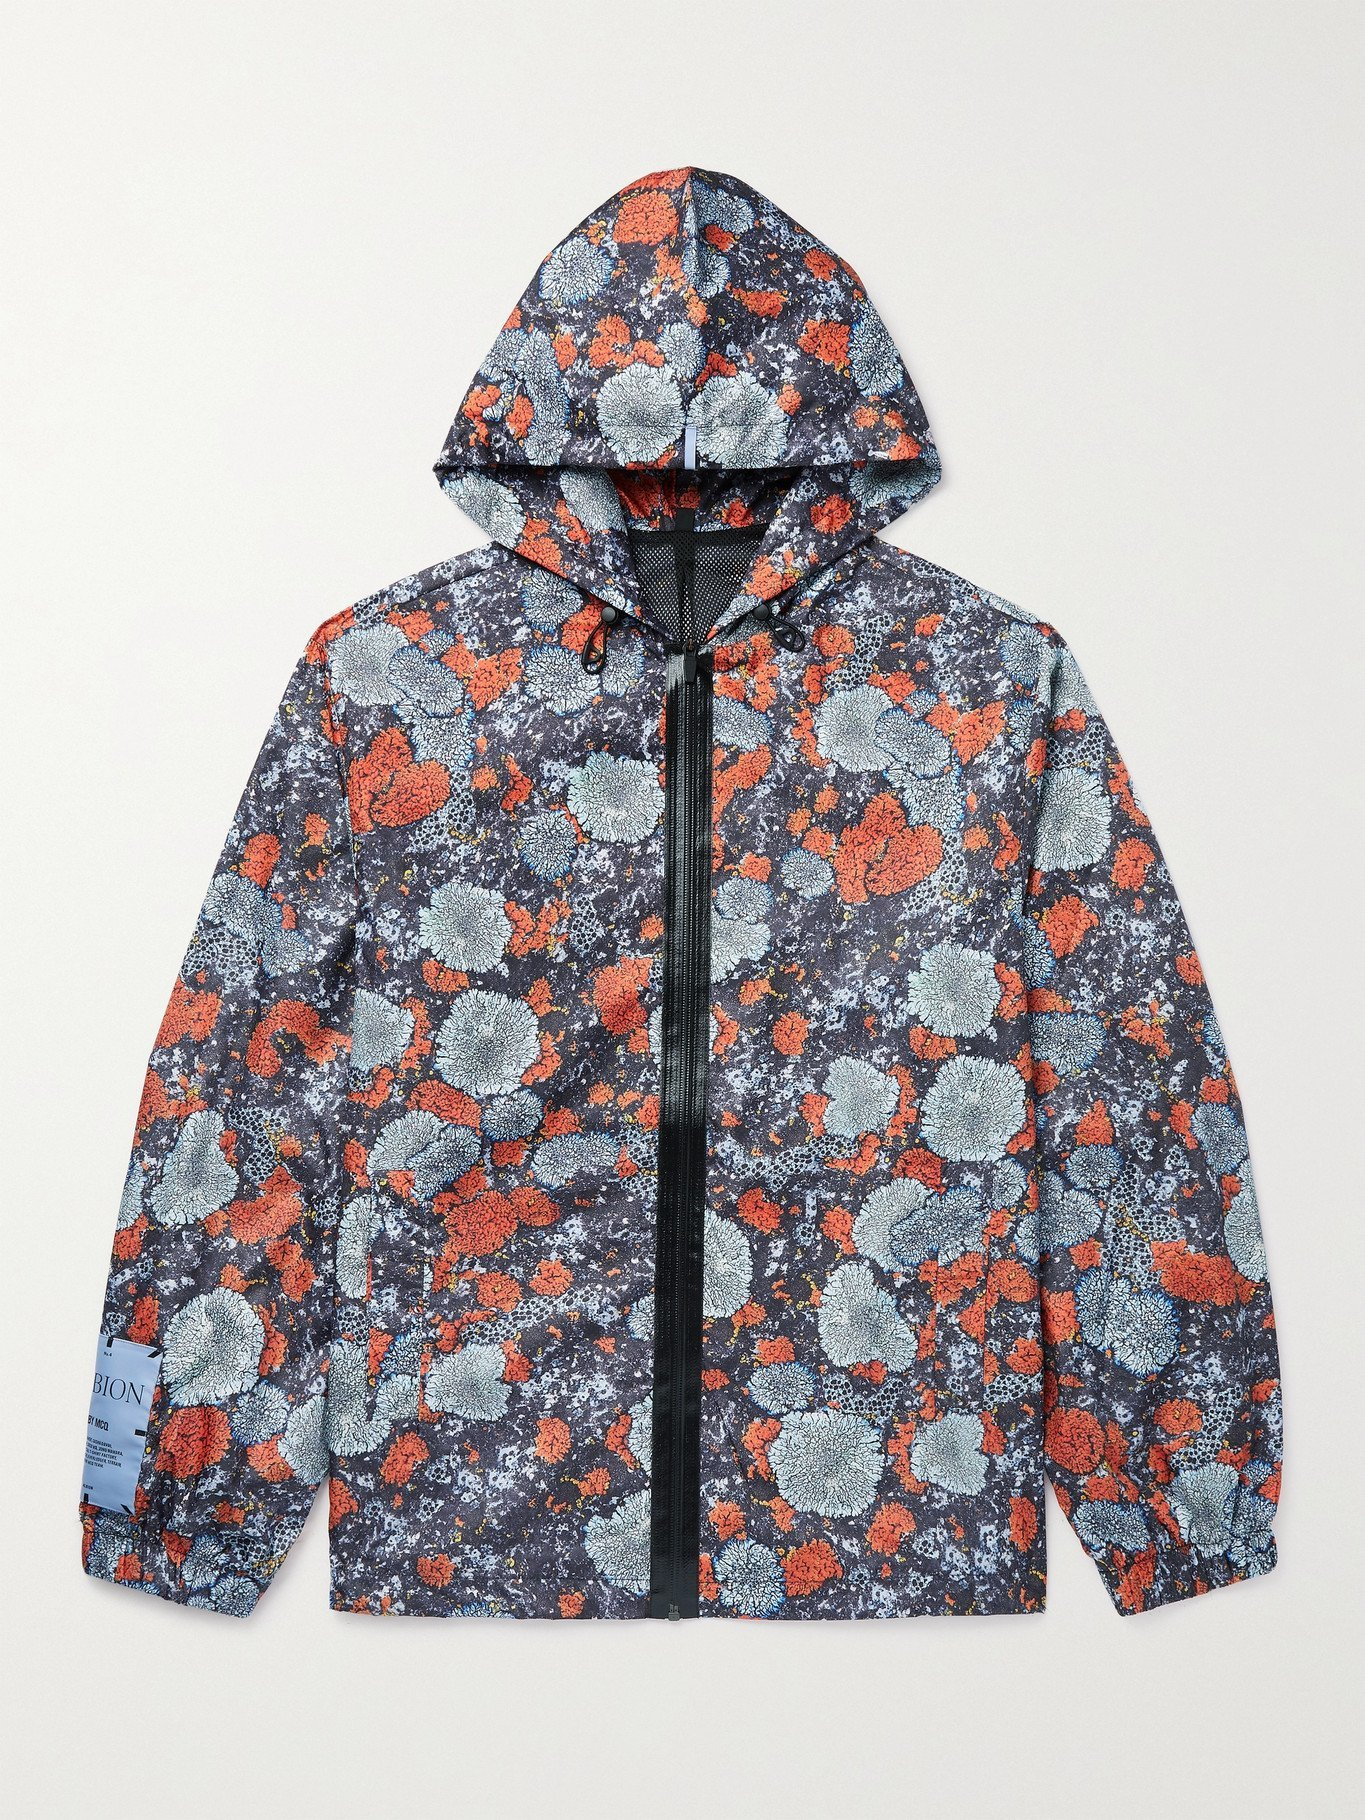 MCQ - Albion Appliquéd Printed Shell Hooded Jacket - Orange